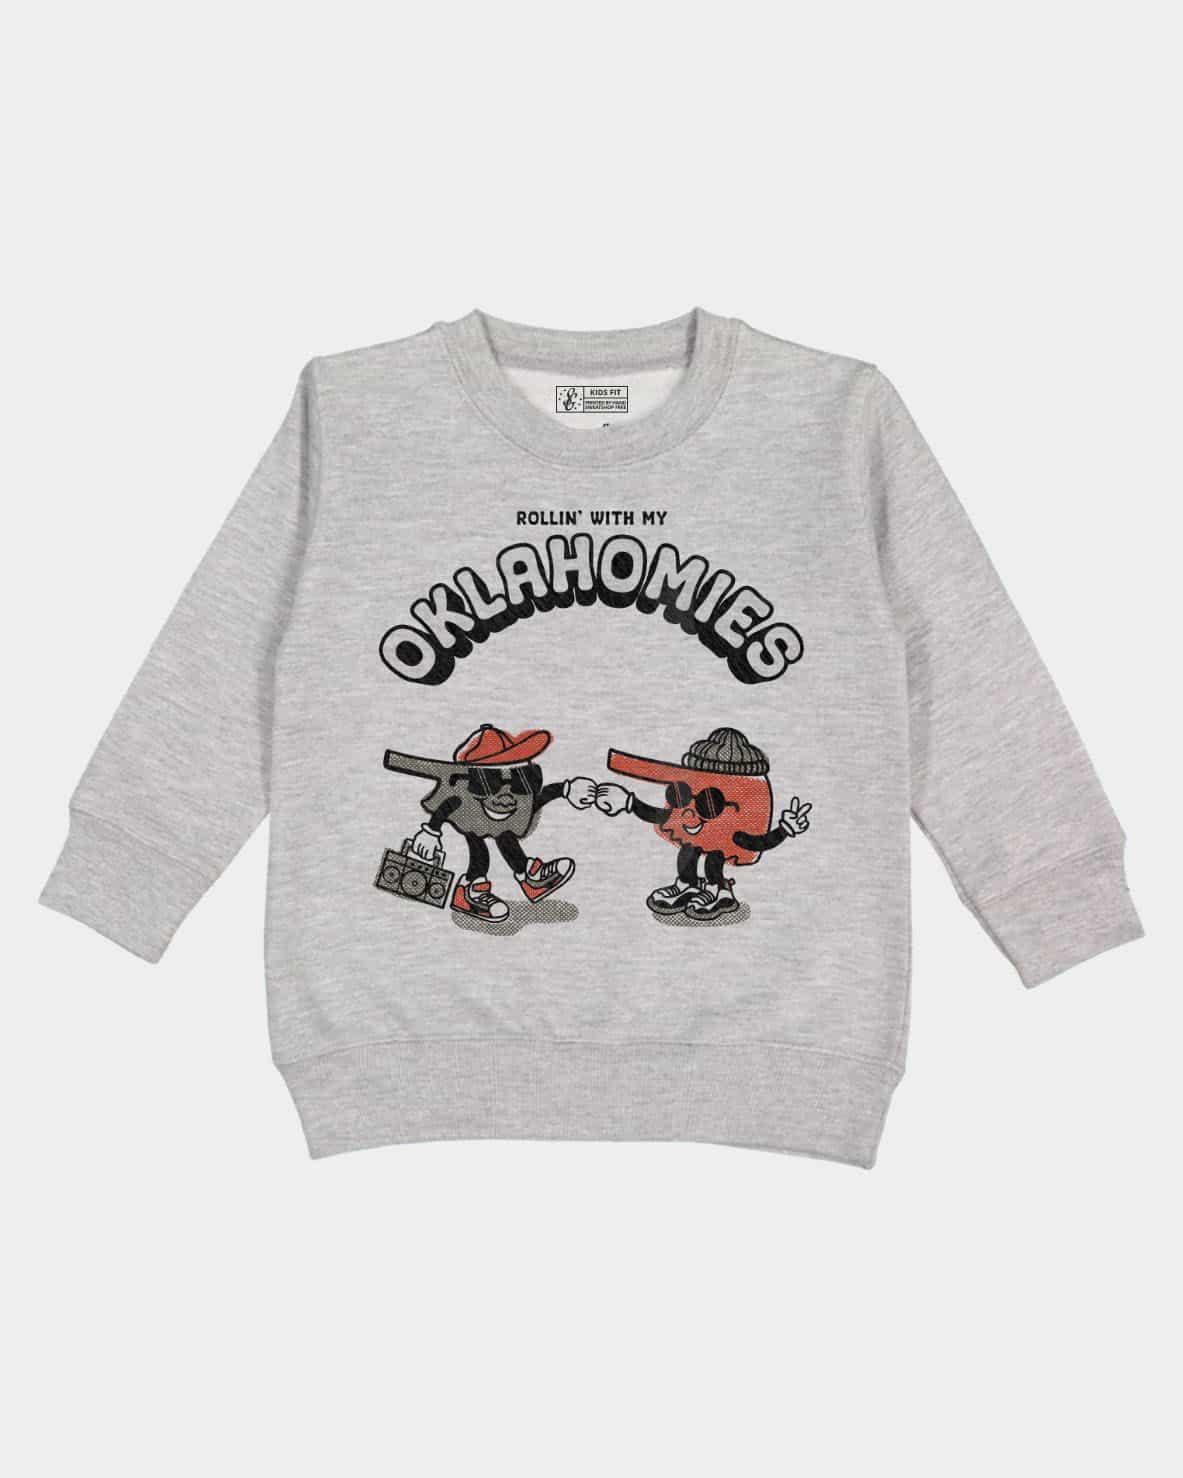 Oklahomies Kids Pullover Sweatshirt